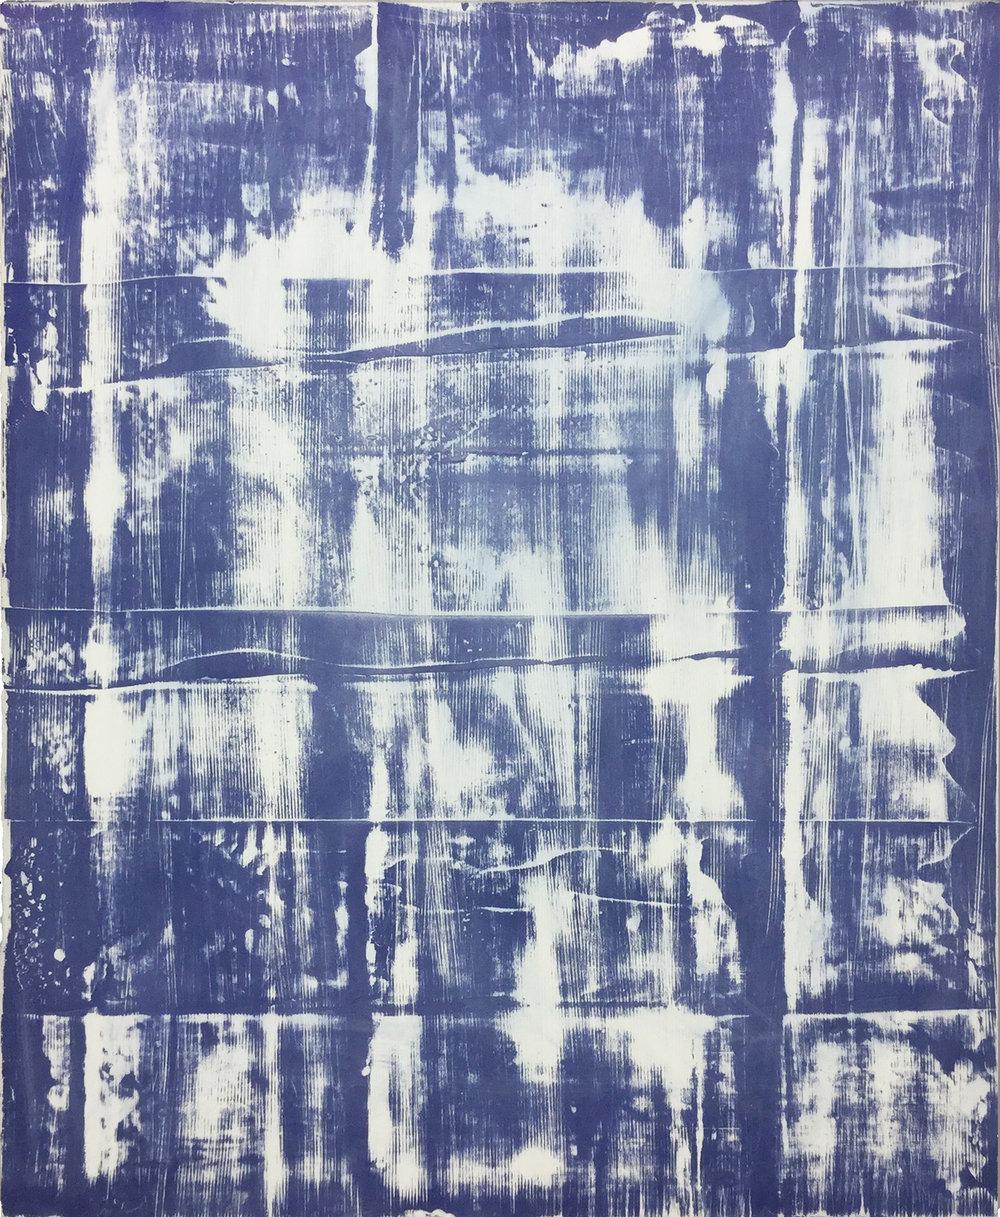 "Offcut 02, 2017, plaster and spray paint on gypsum, 30 X 24"" (76 X 61 cm)"